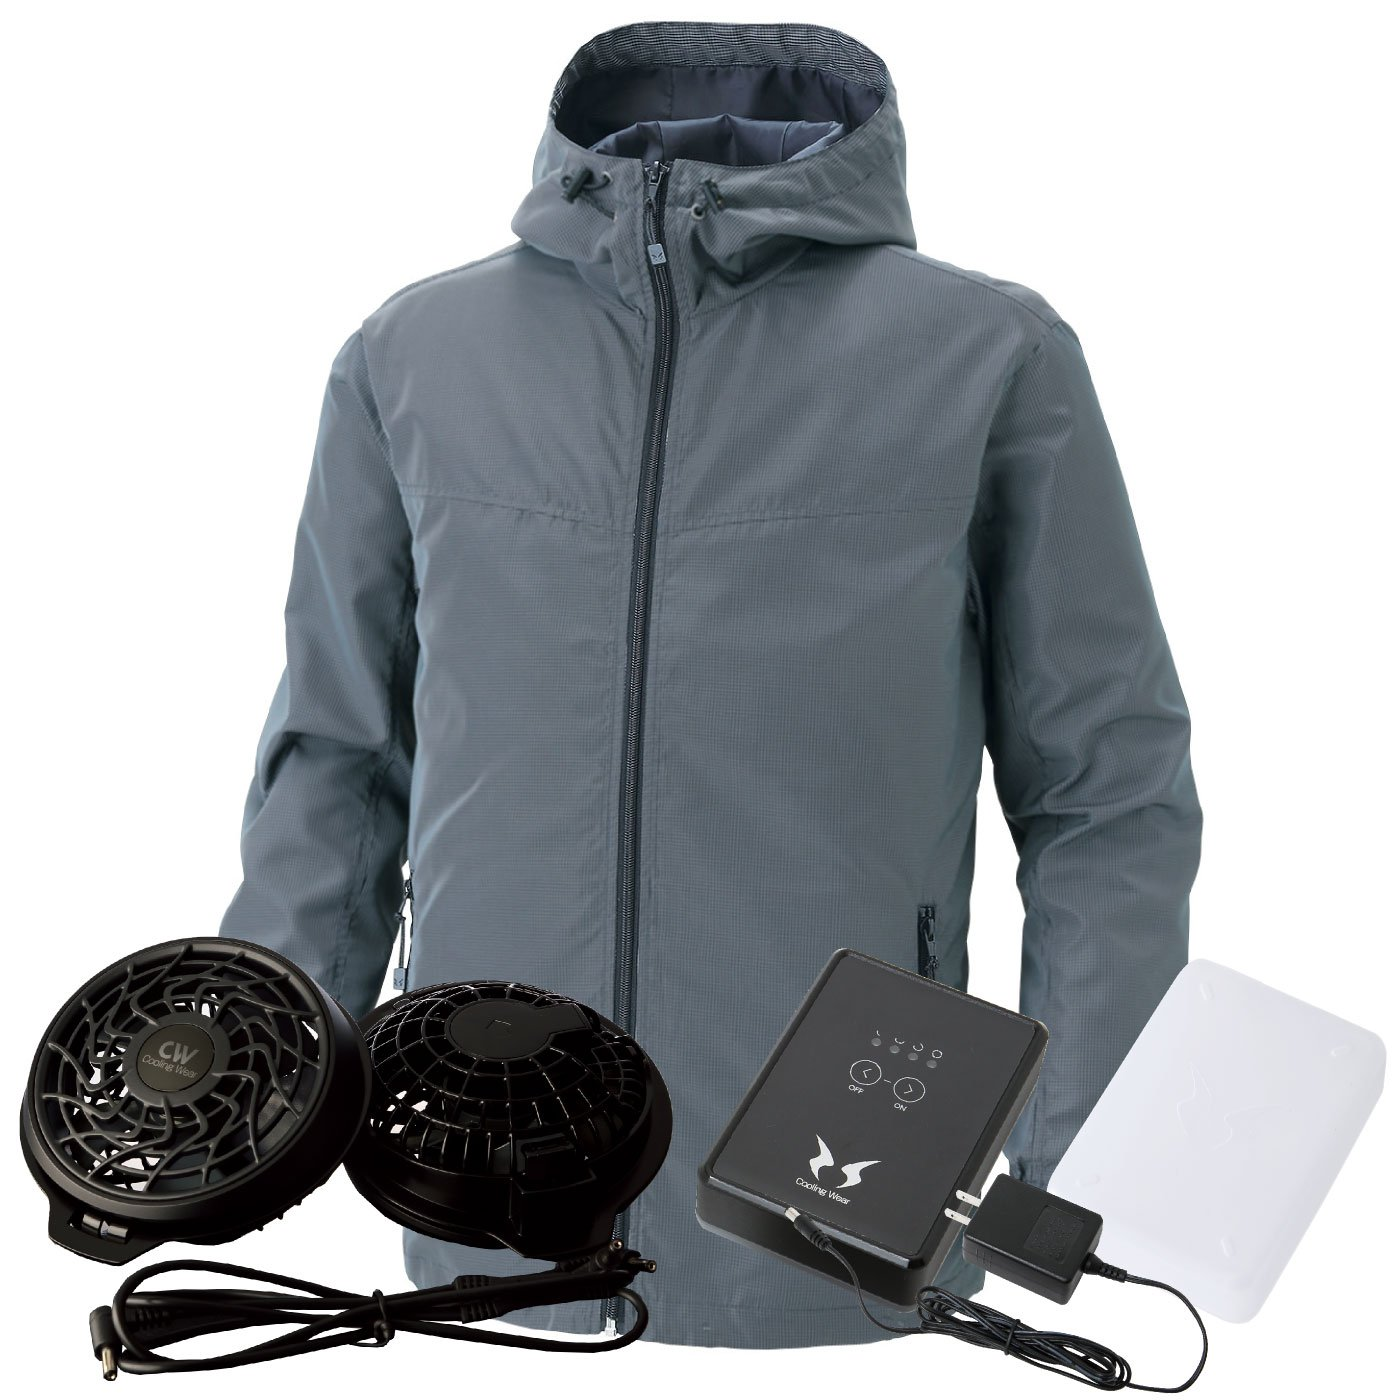 SUN-S(サンエス) 空調風神服 フード付 ss-ku90700-lx 【空調服+ファン+バッテリー】 B07CSKC5RQ XL|チャコール チャコール XL